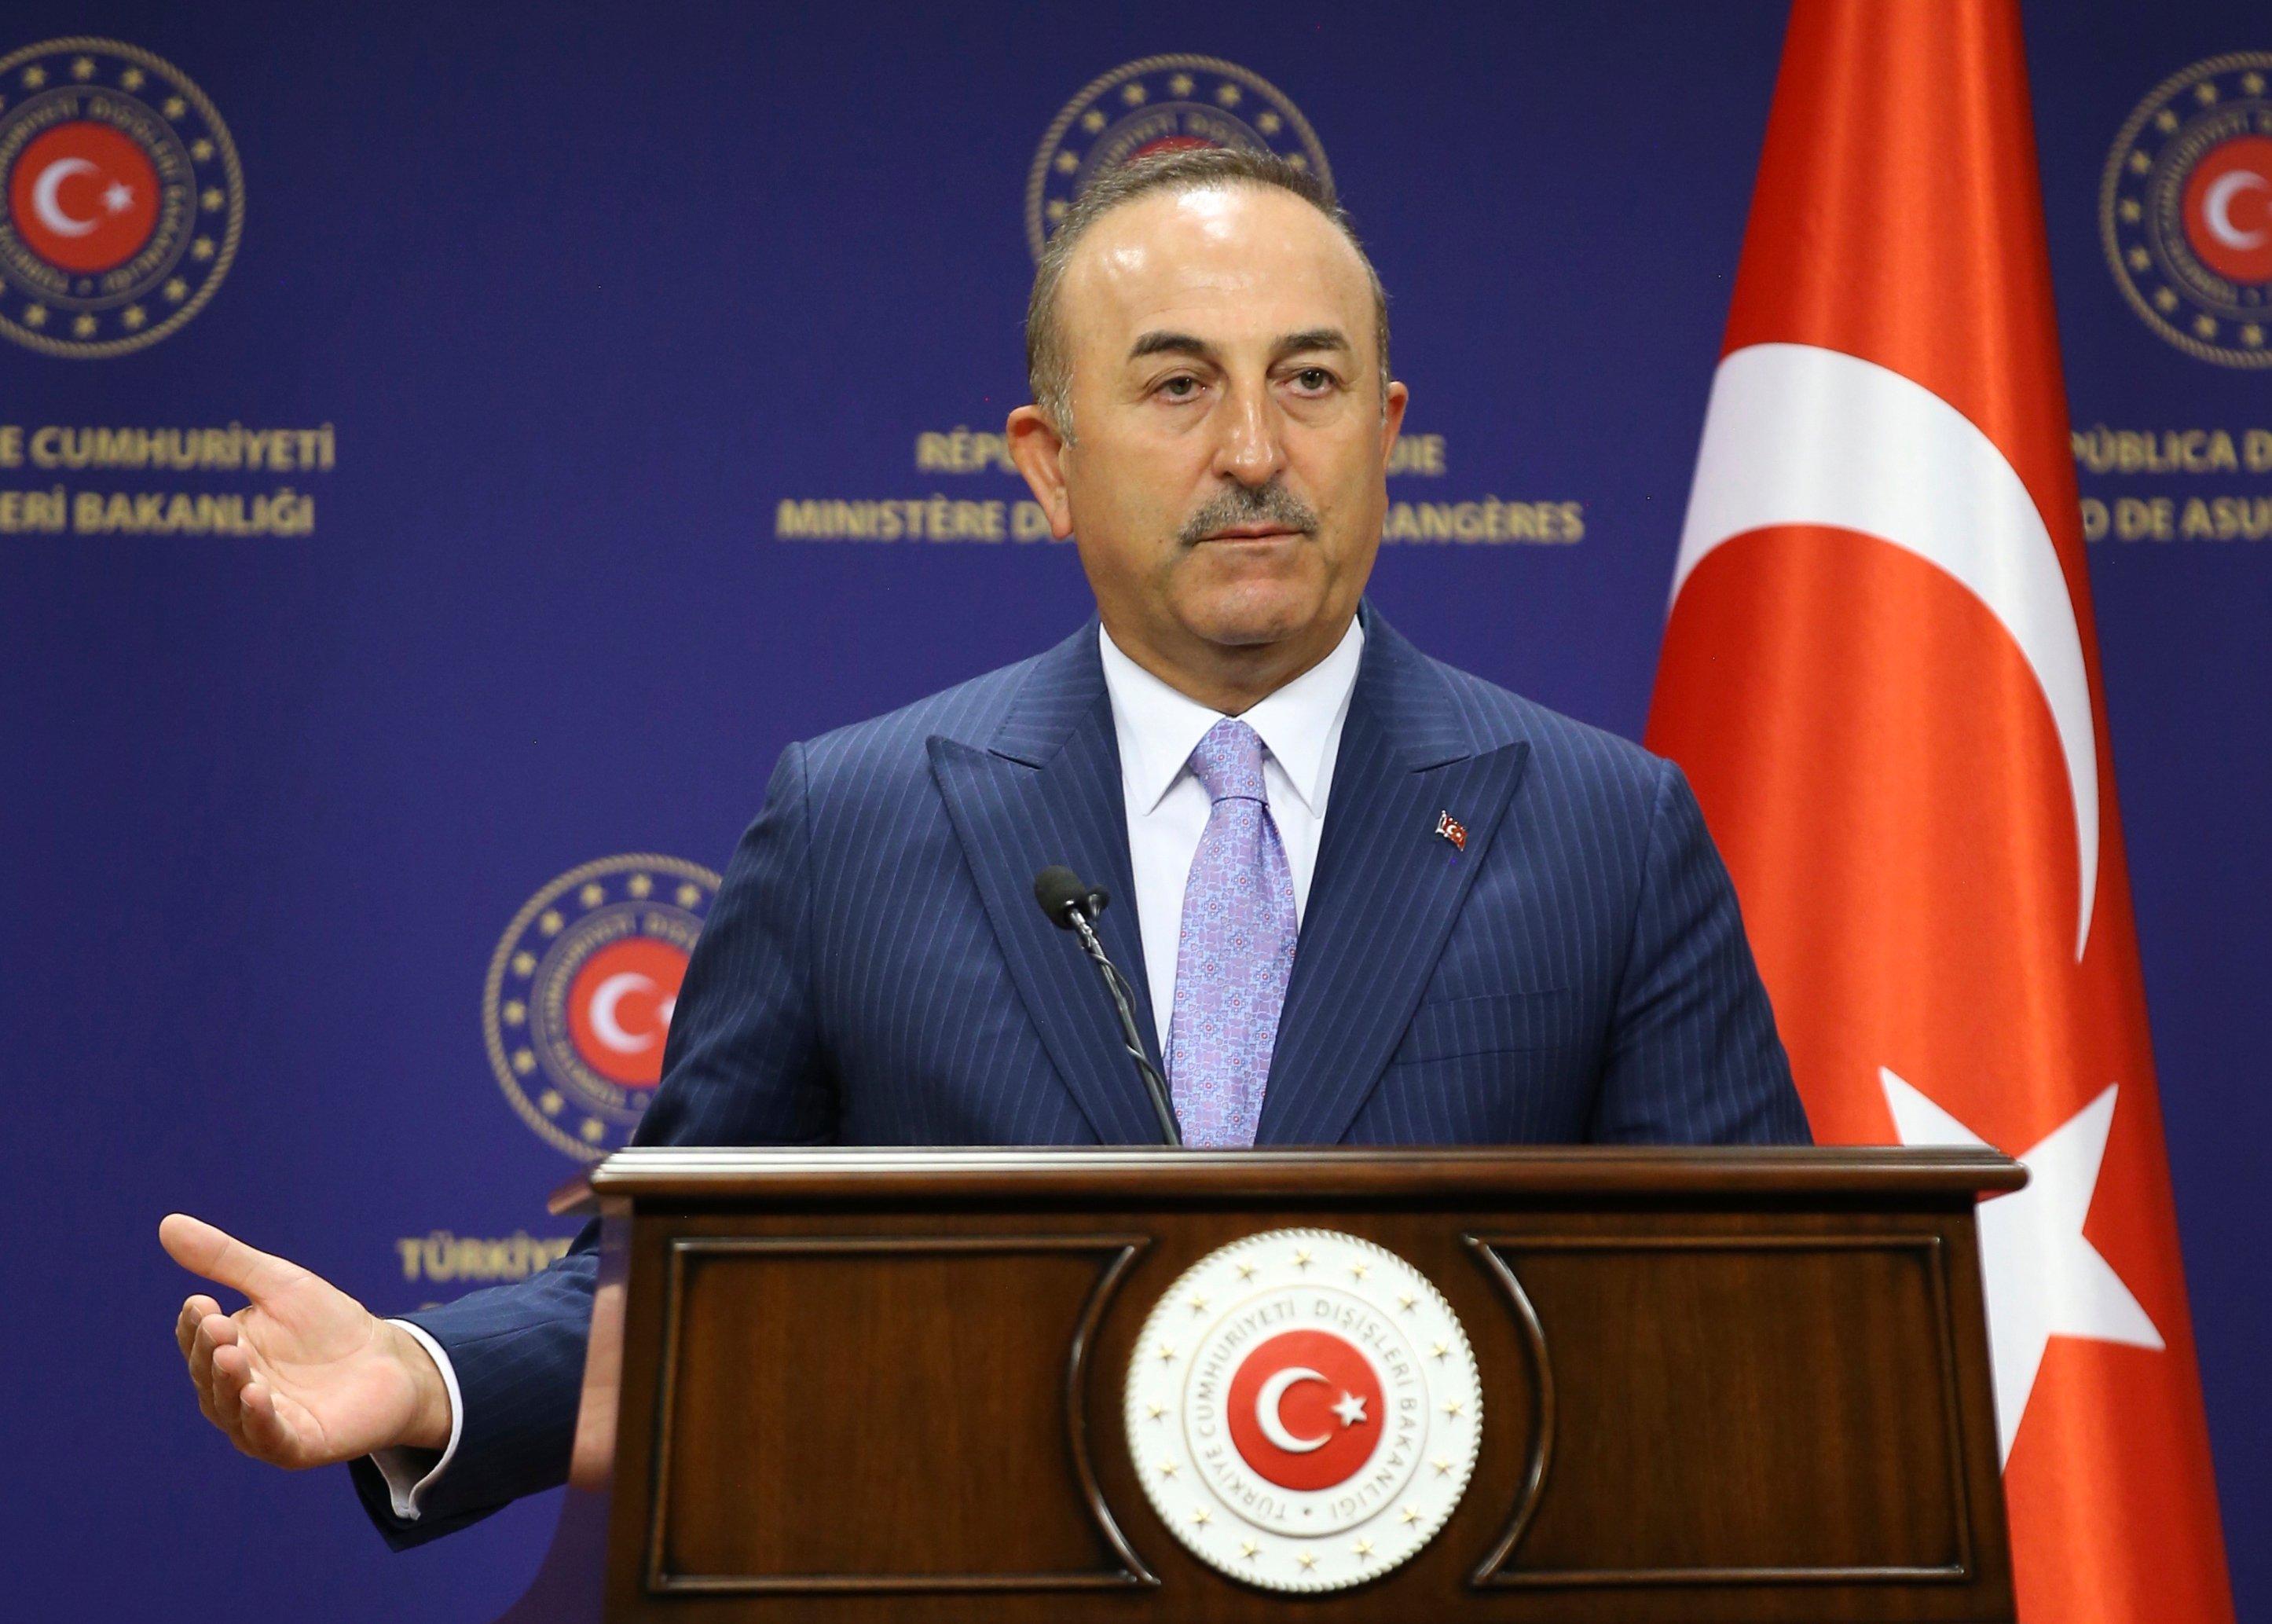 Cavusoglu: «Θα αποδείξουμε στην πράξη ότι η συμφωνία Ελλάδας και Αιγύπτου είναι άκυρη»